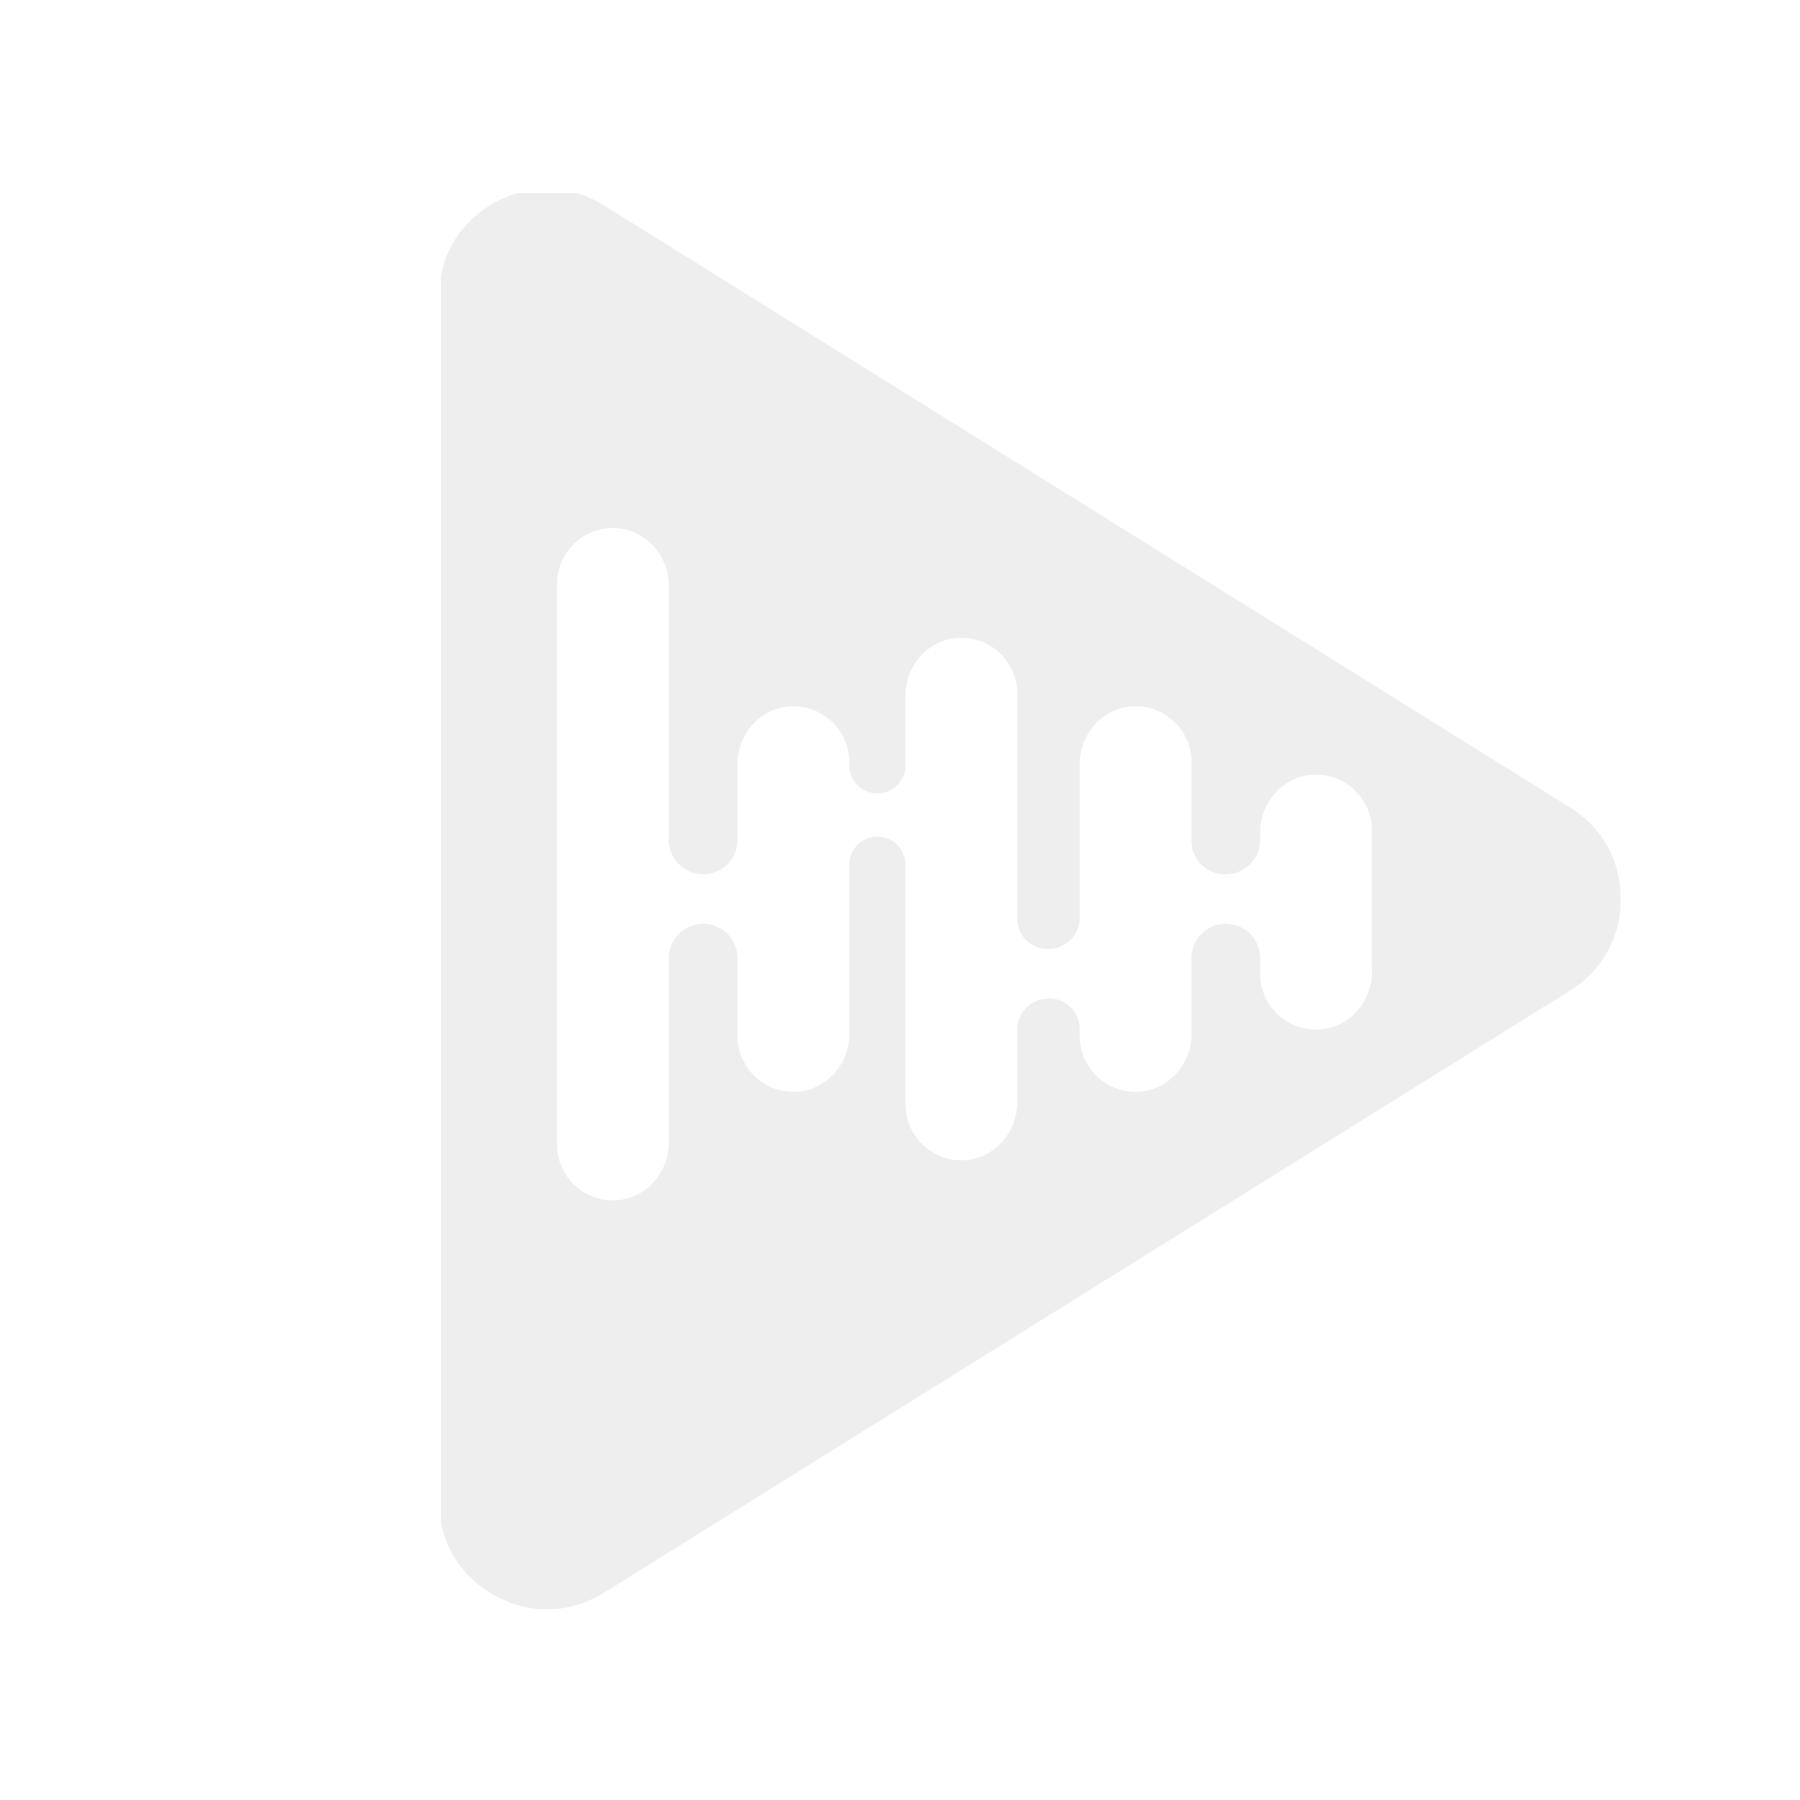 Hertz HCP 1DK - DEMO